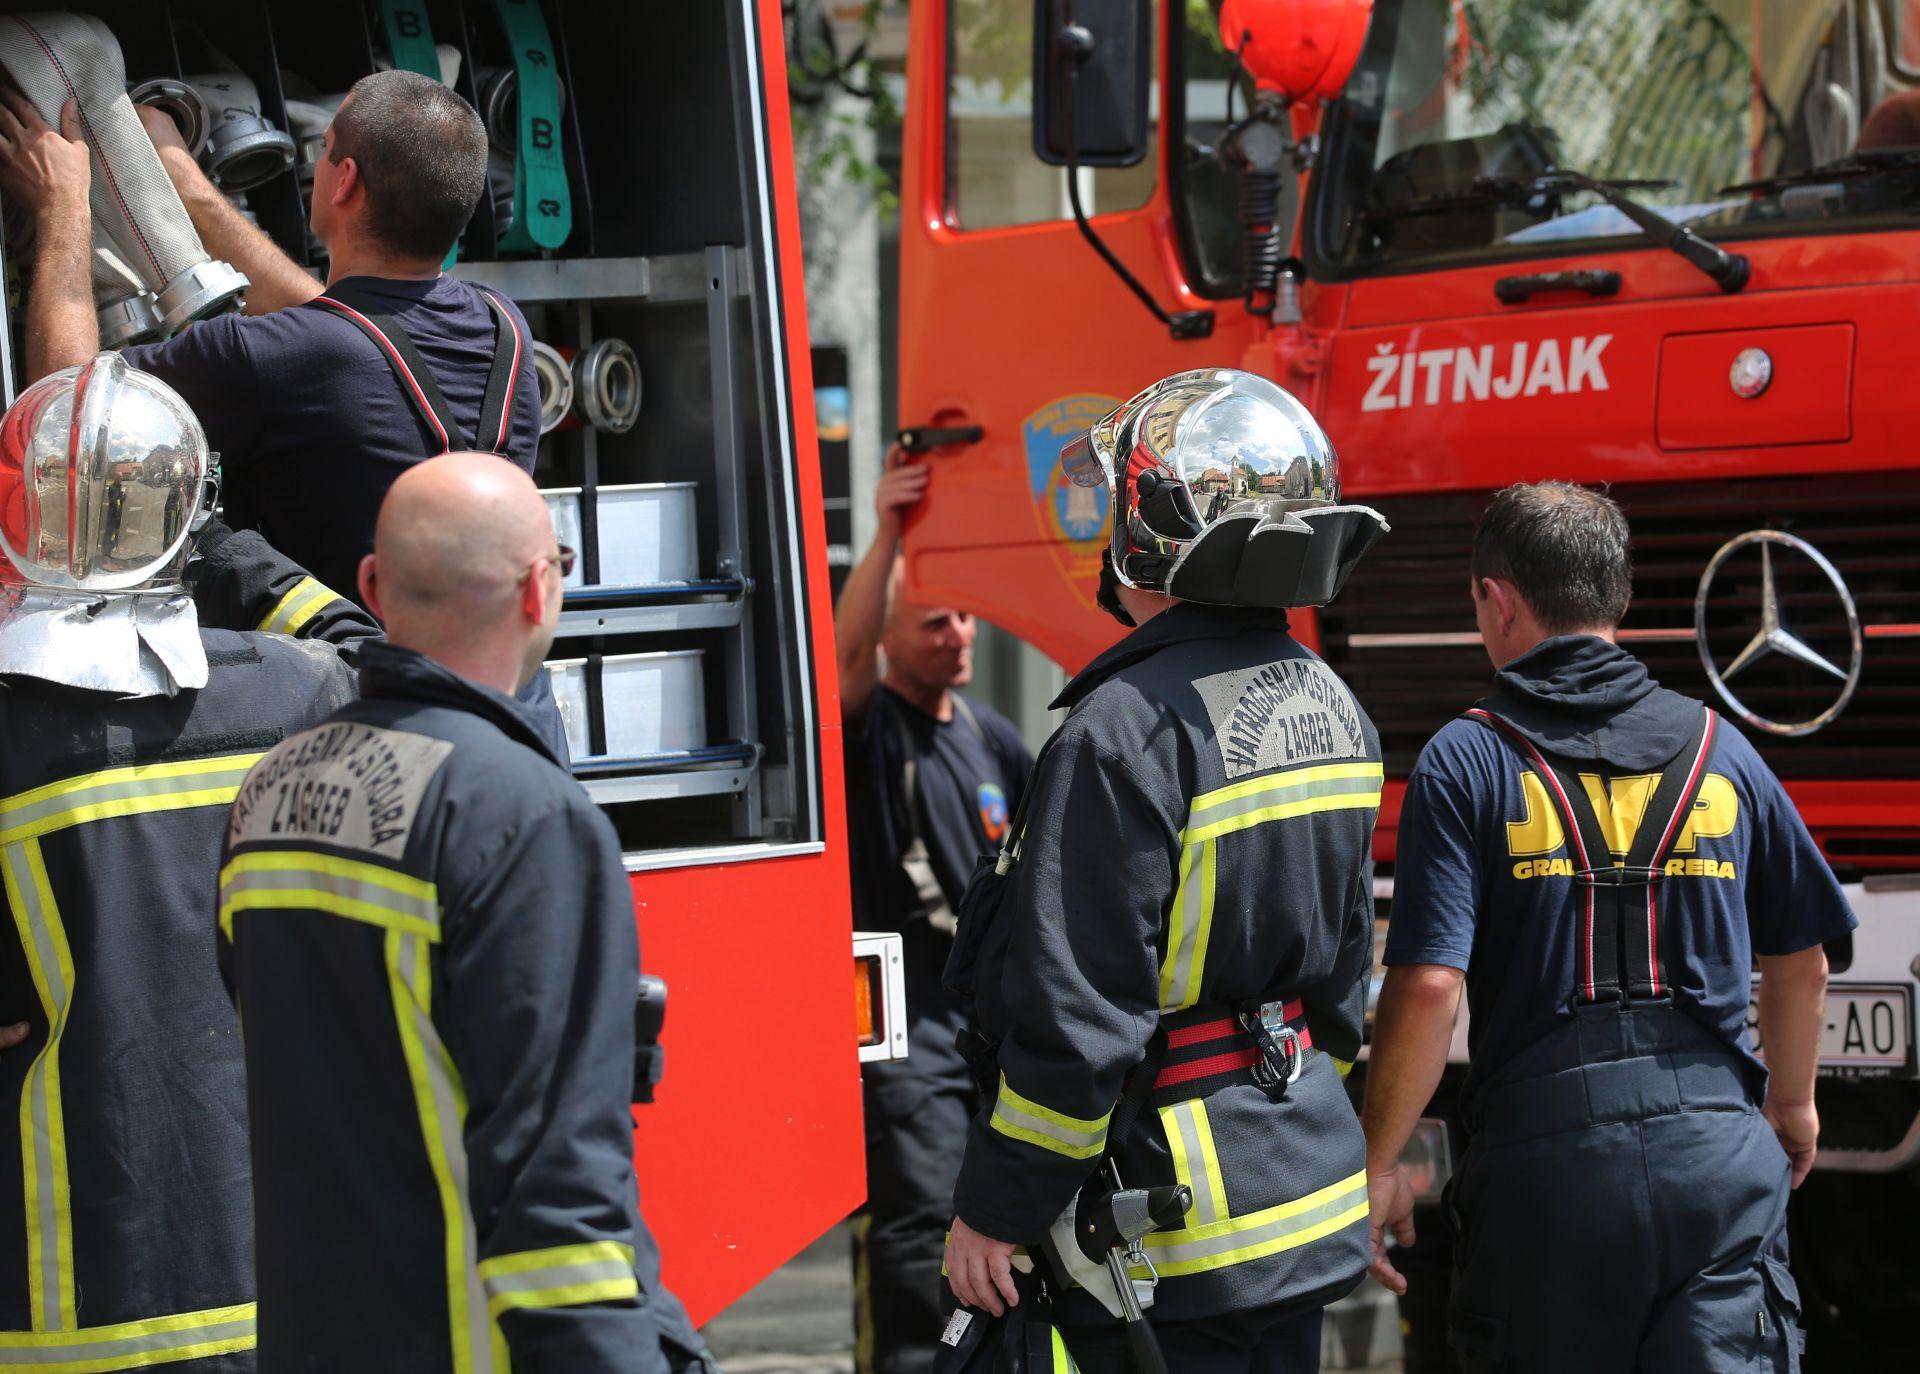 Nakon nevremena u Zagrebu, na terenu 30-ak vatrogasnih ekipa